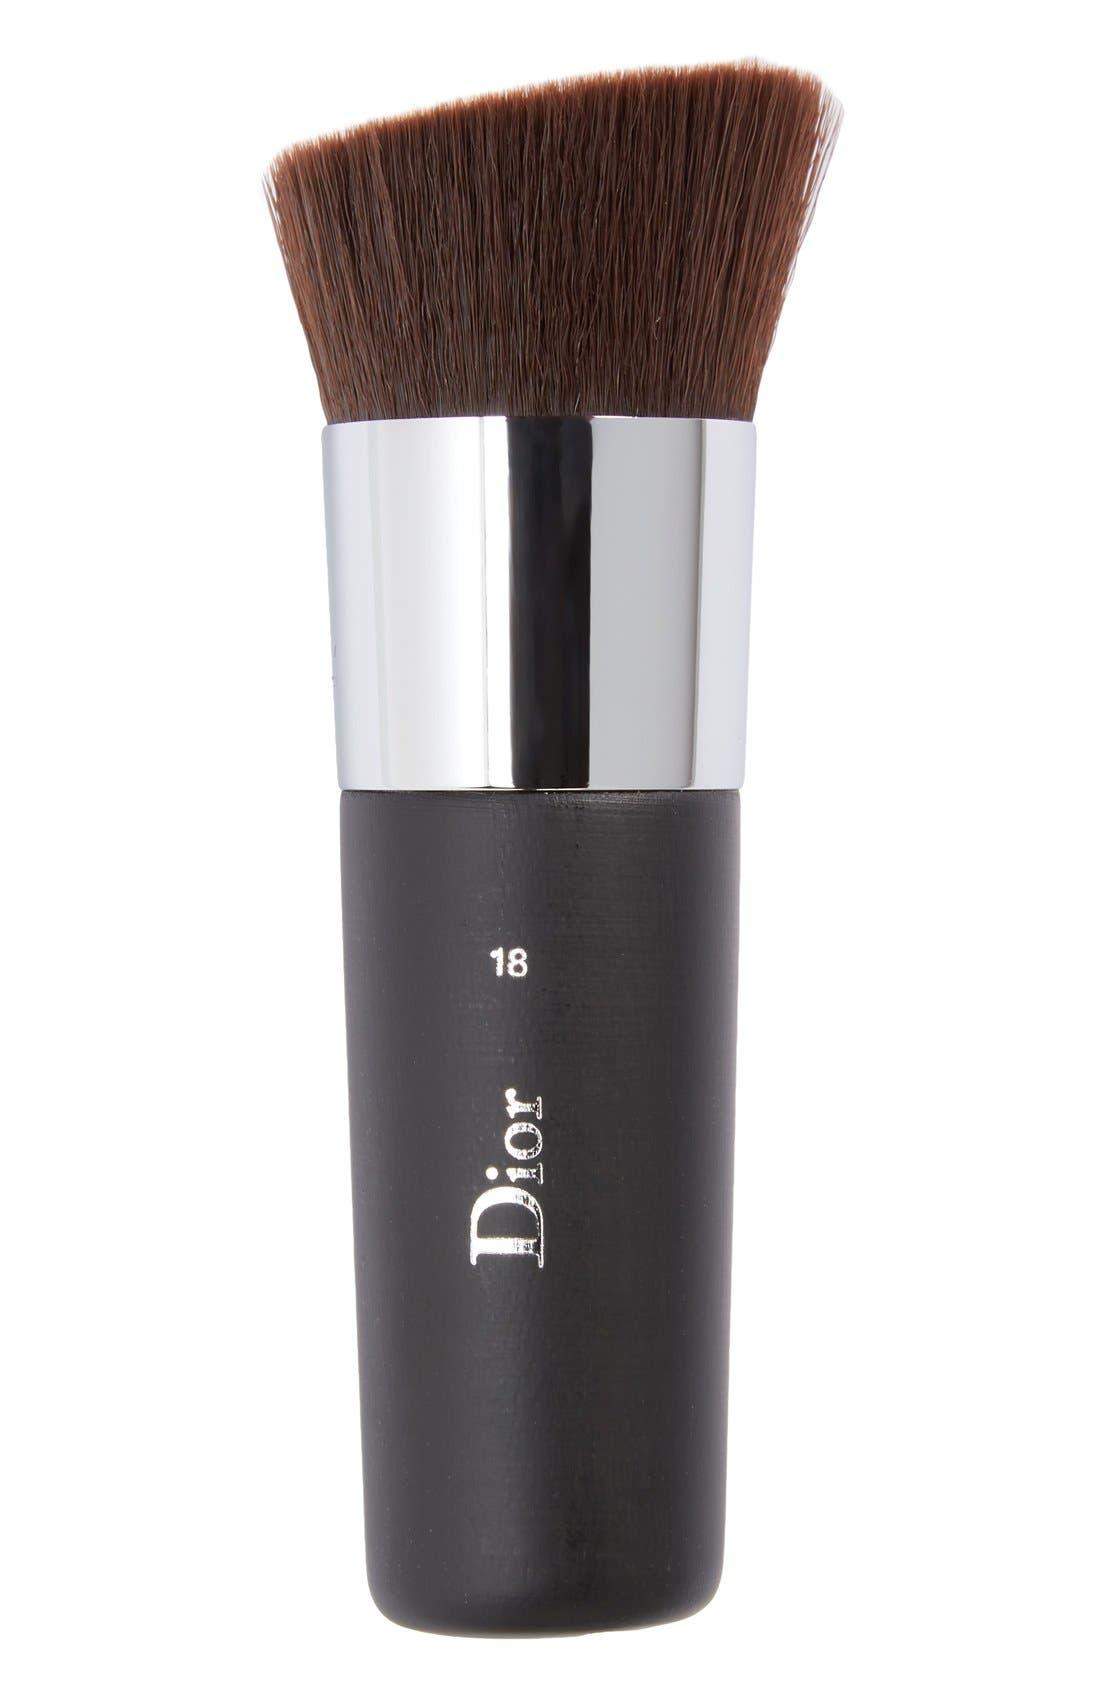 Dior 'Diorskin Airflash' Spray Foundation Brush No. 18